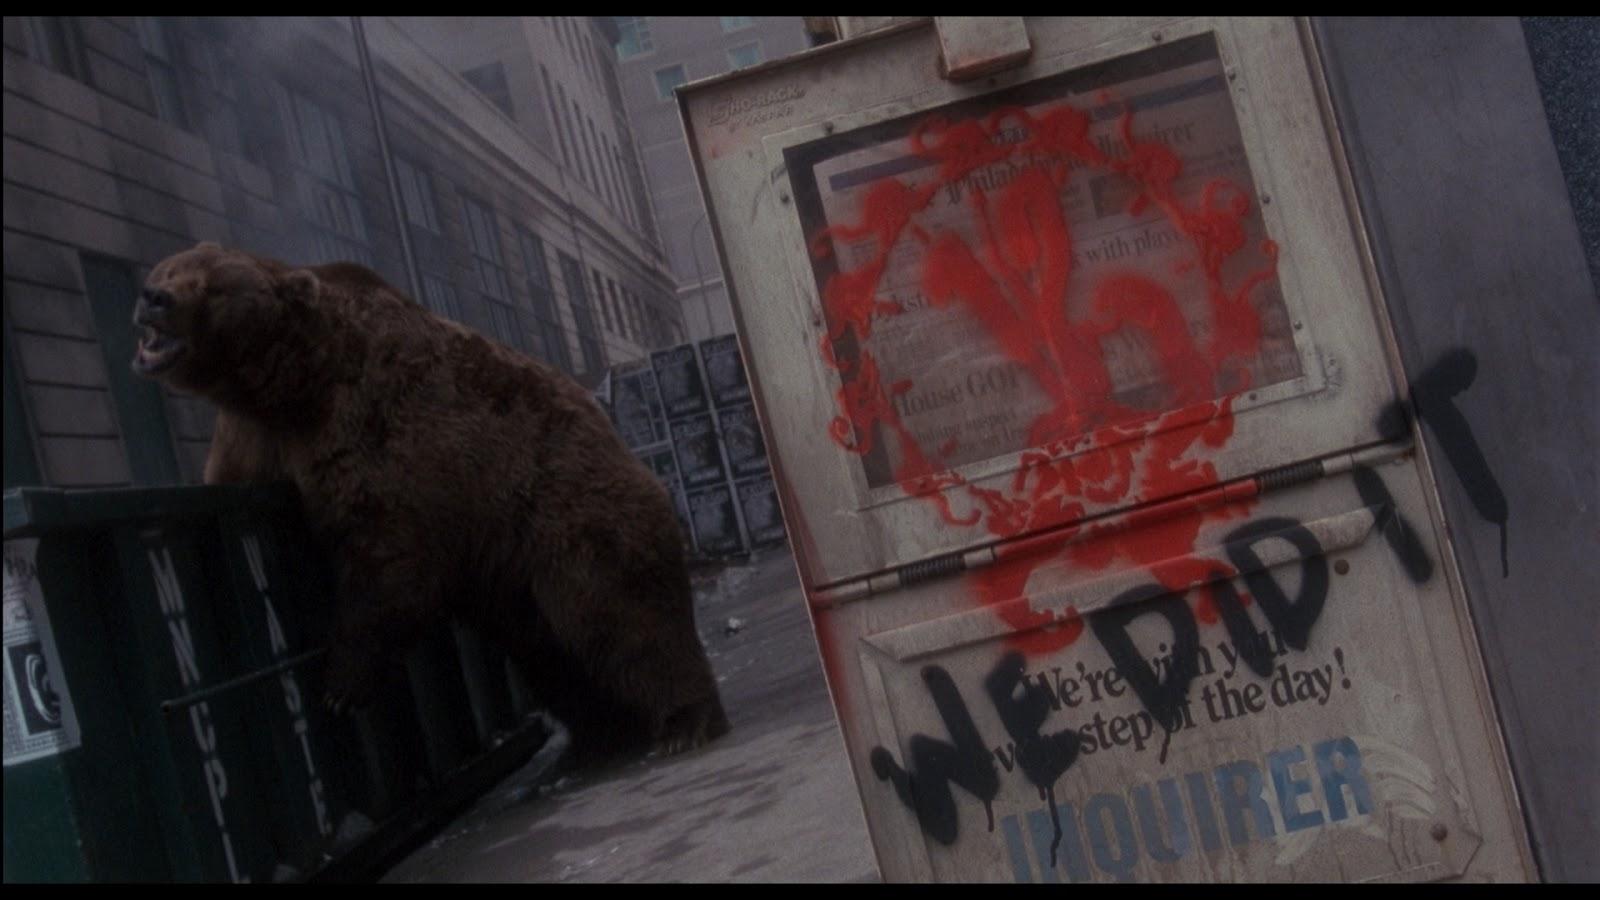 movies_bears_12_monkeys_desktop_1920x1080_wallpaper-1114982.jpeg